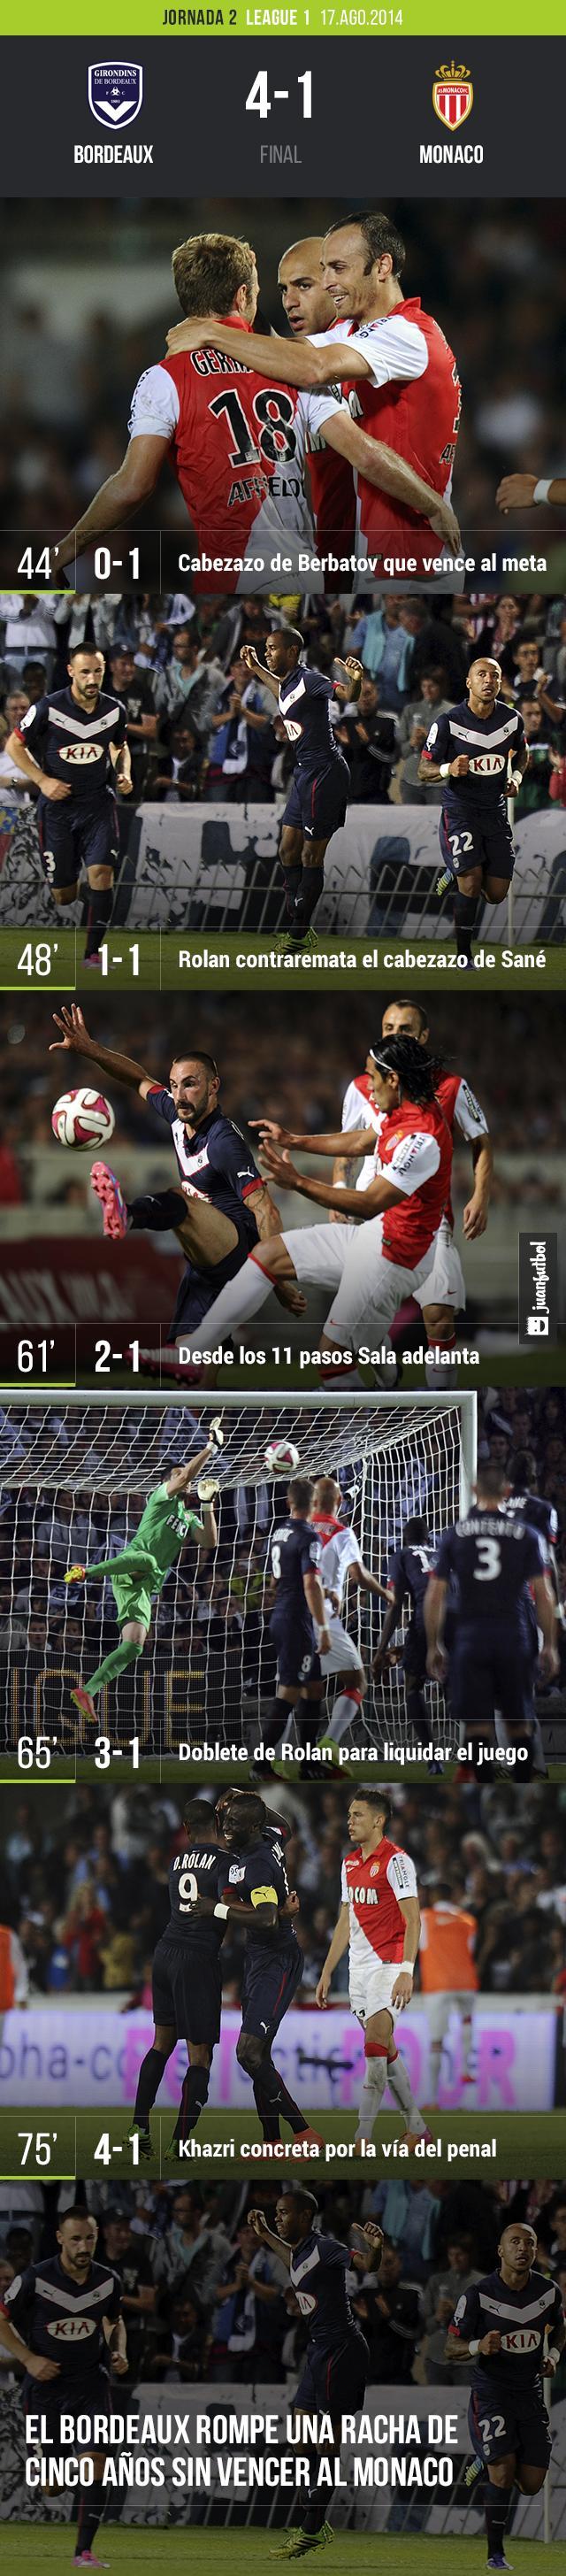 Bordeaux 4-1 Monaco